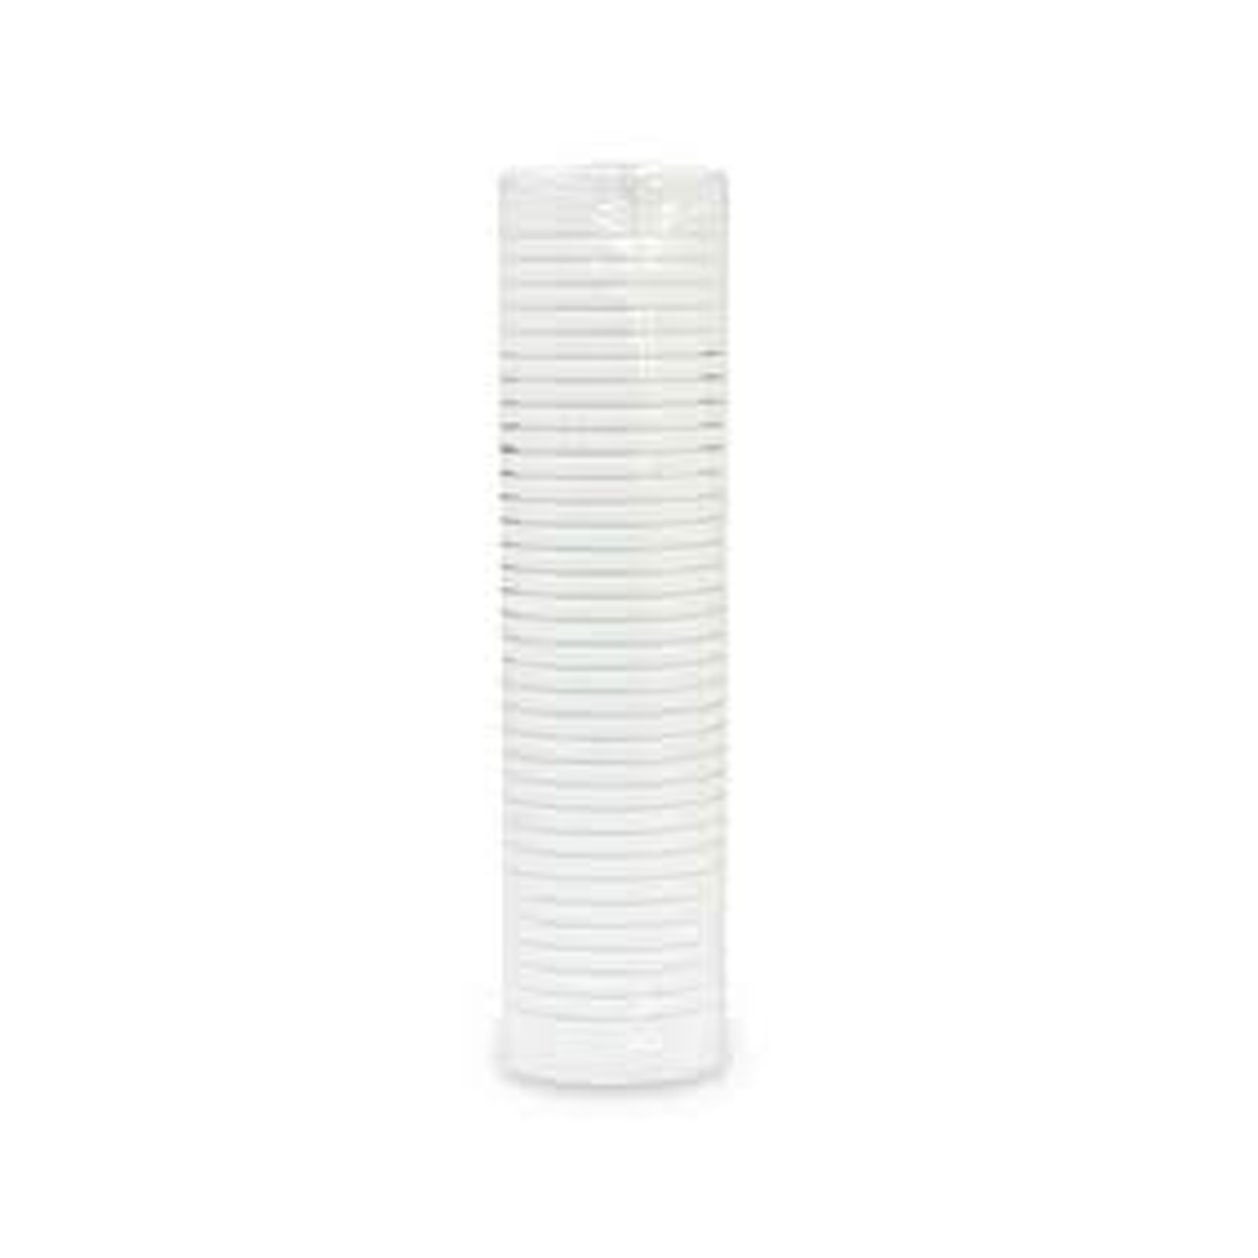 AquaPure 5620406 Replacement Filter Alfi